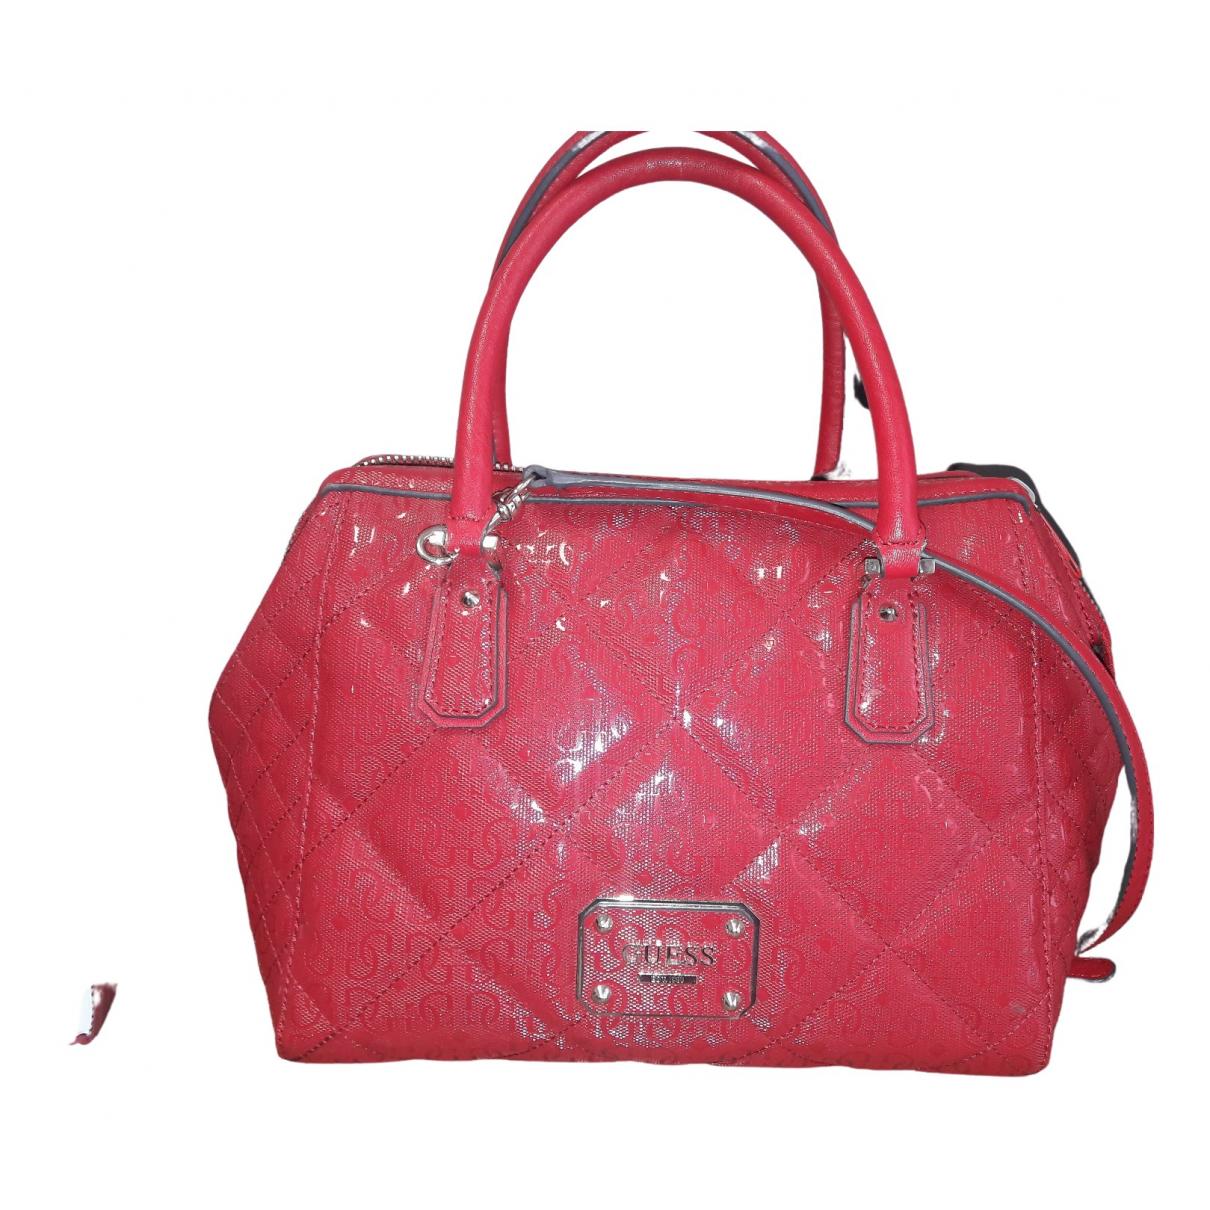 Guess N Red handbag for Women N